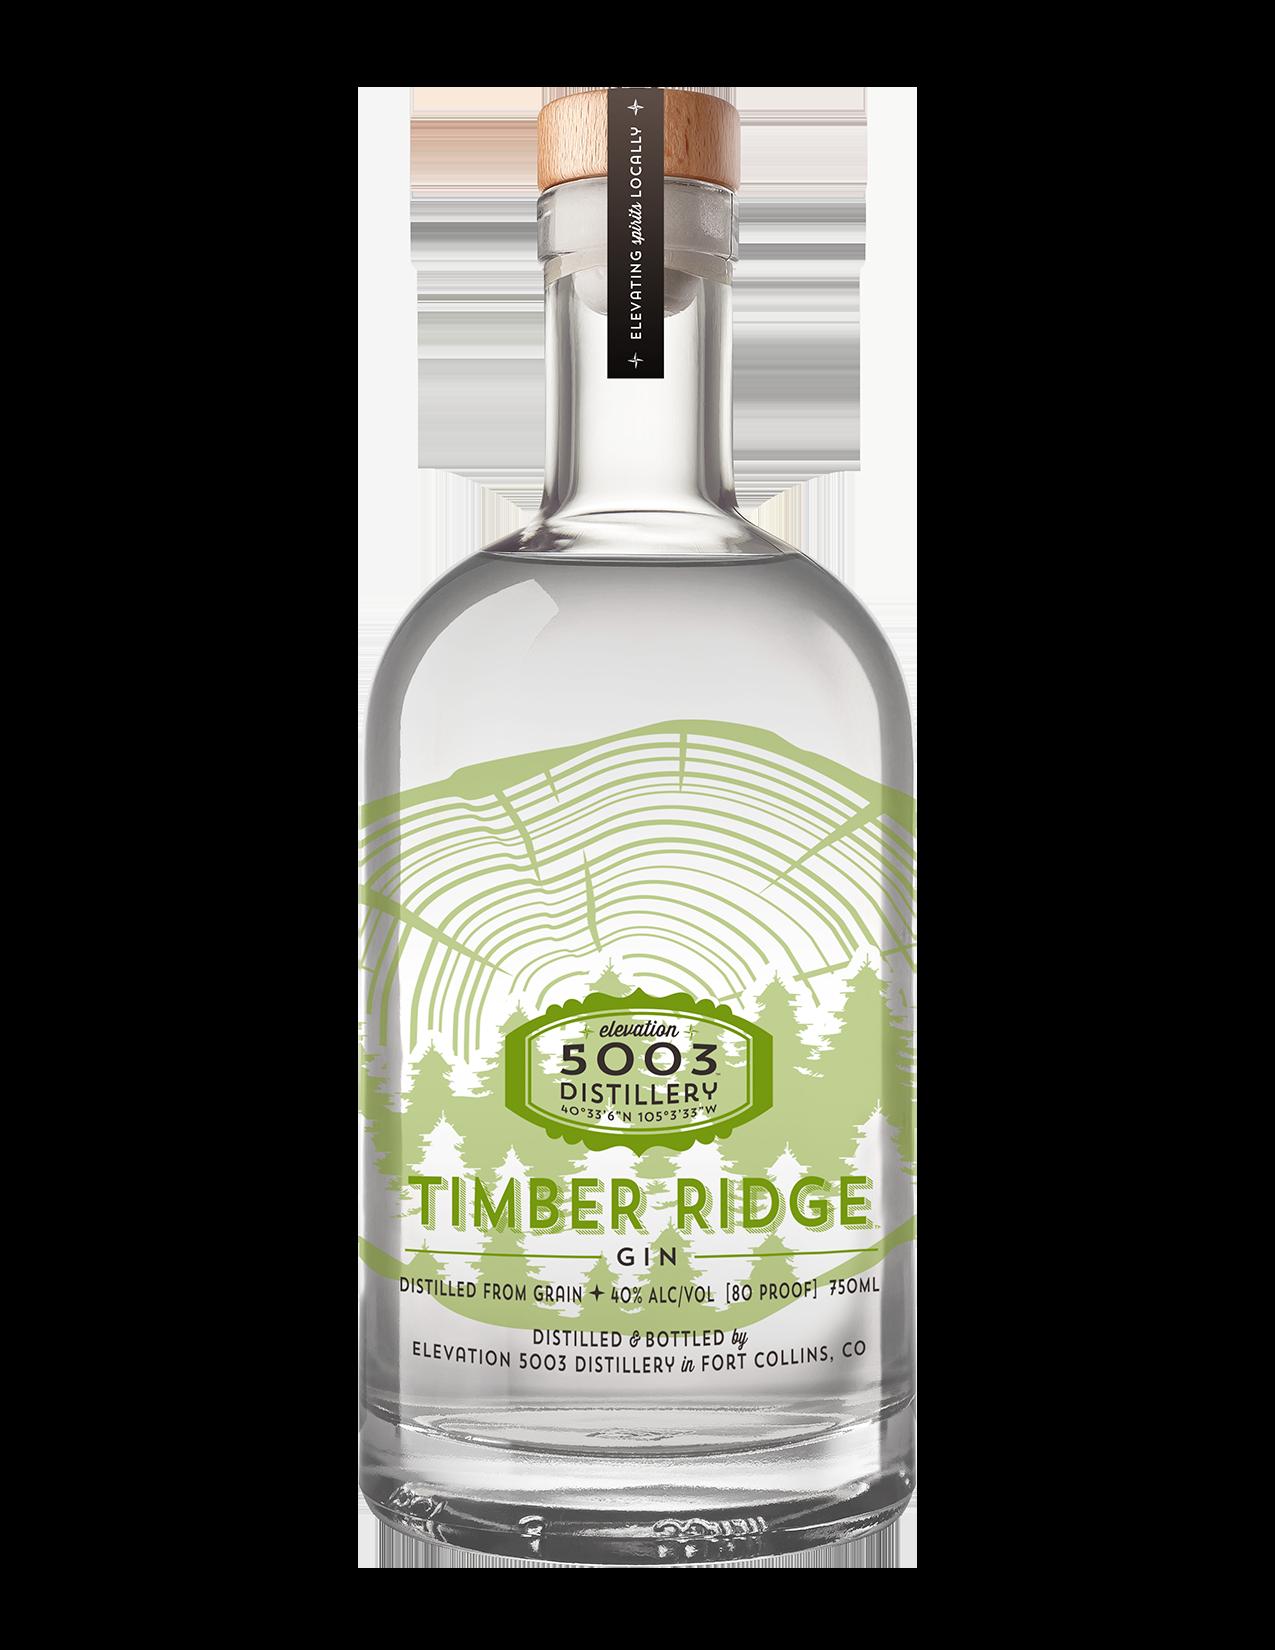 Timber_Ridge_Bottle_comp.png